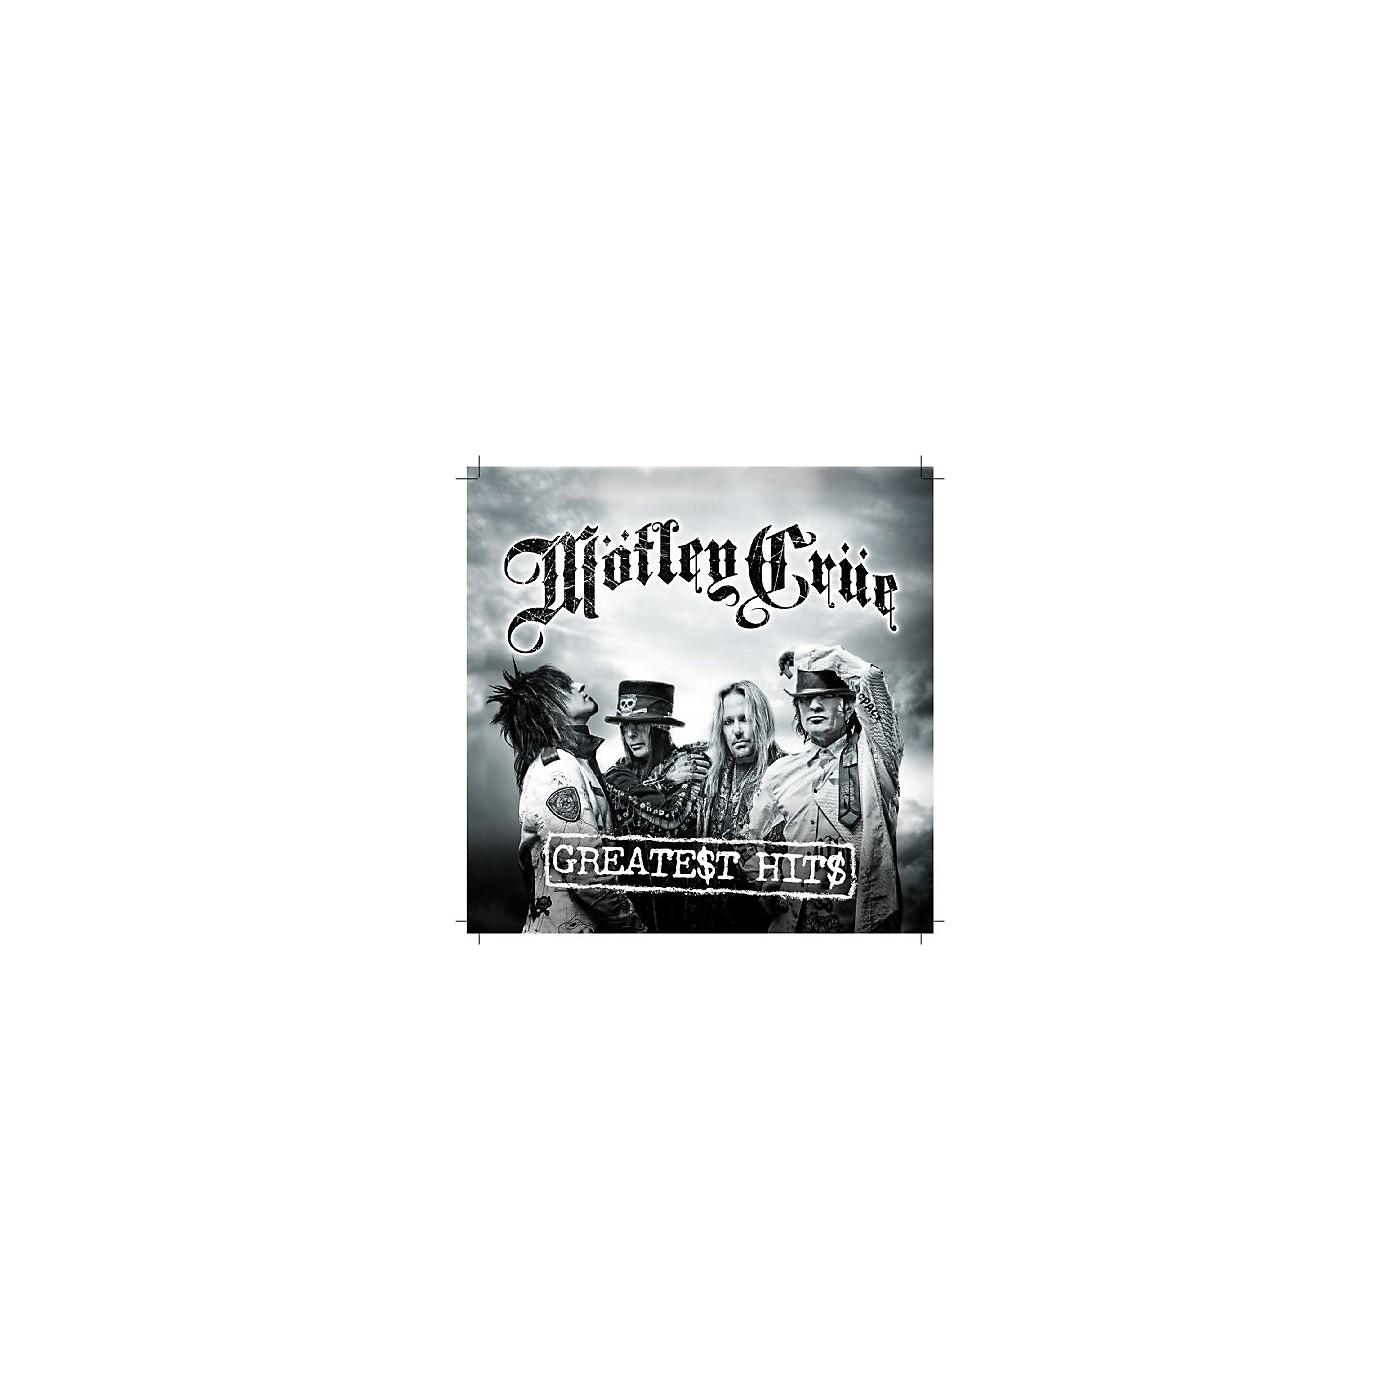 Alliance Motley Crue - Greatest Hits (CD) thumbnail